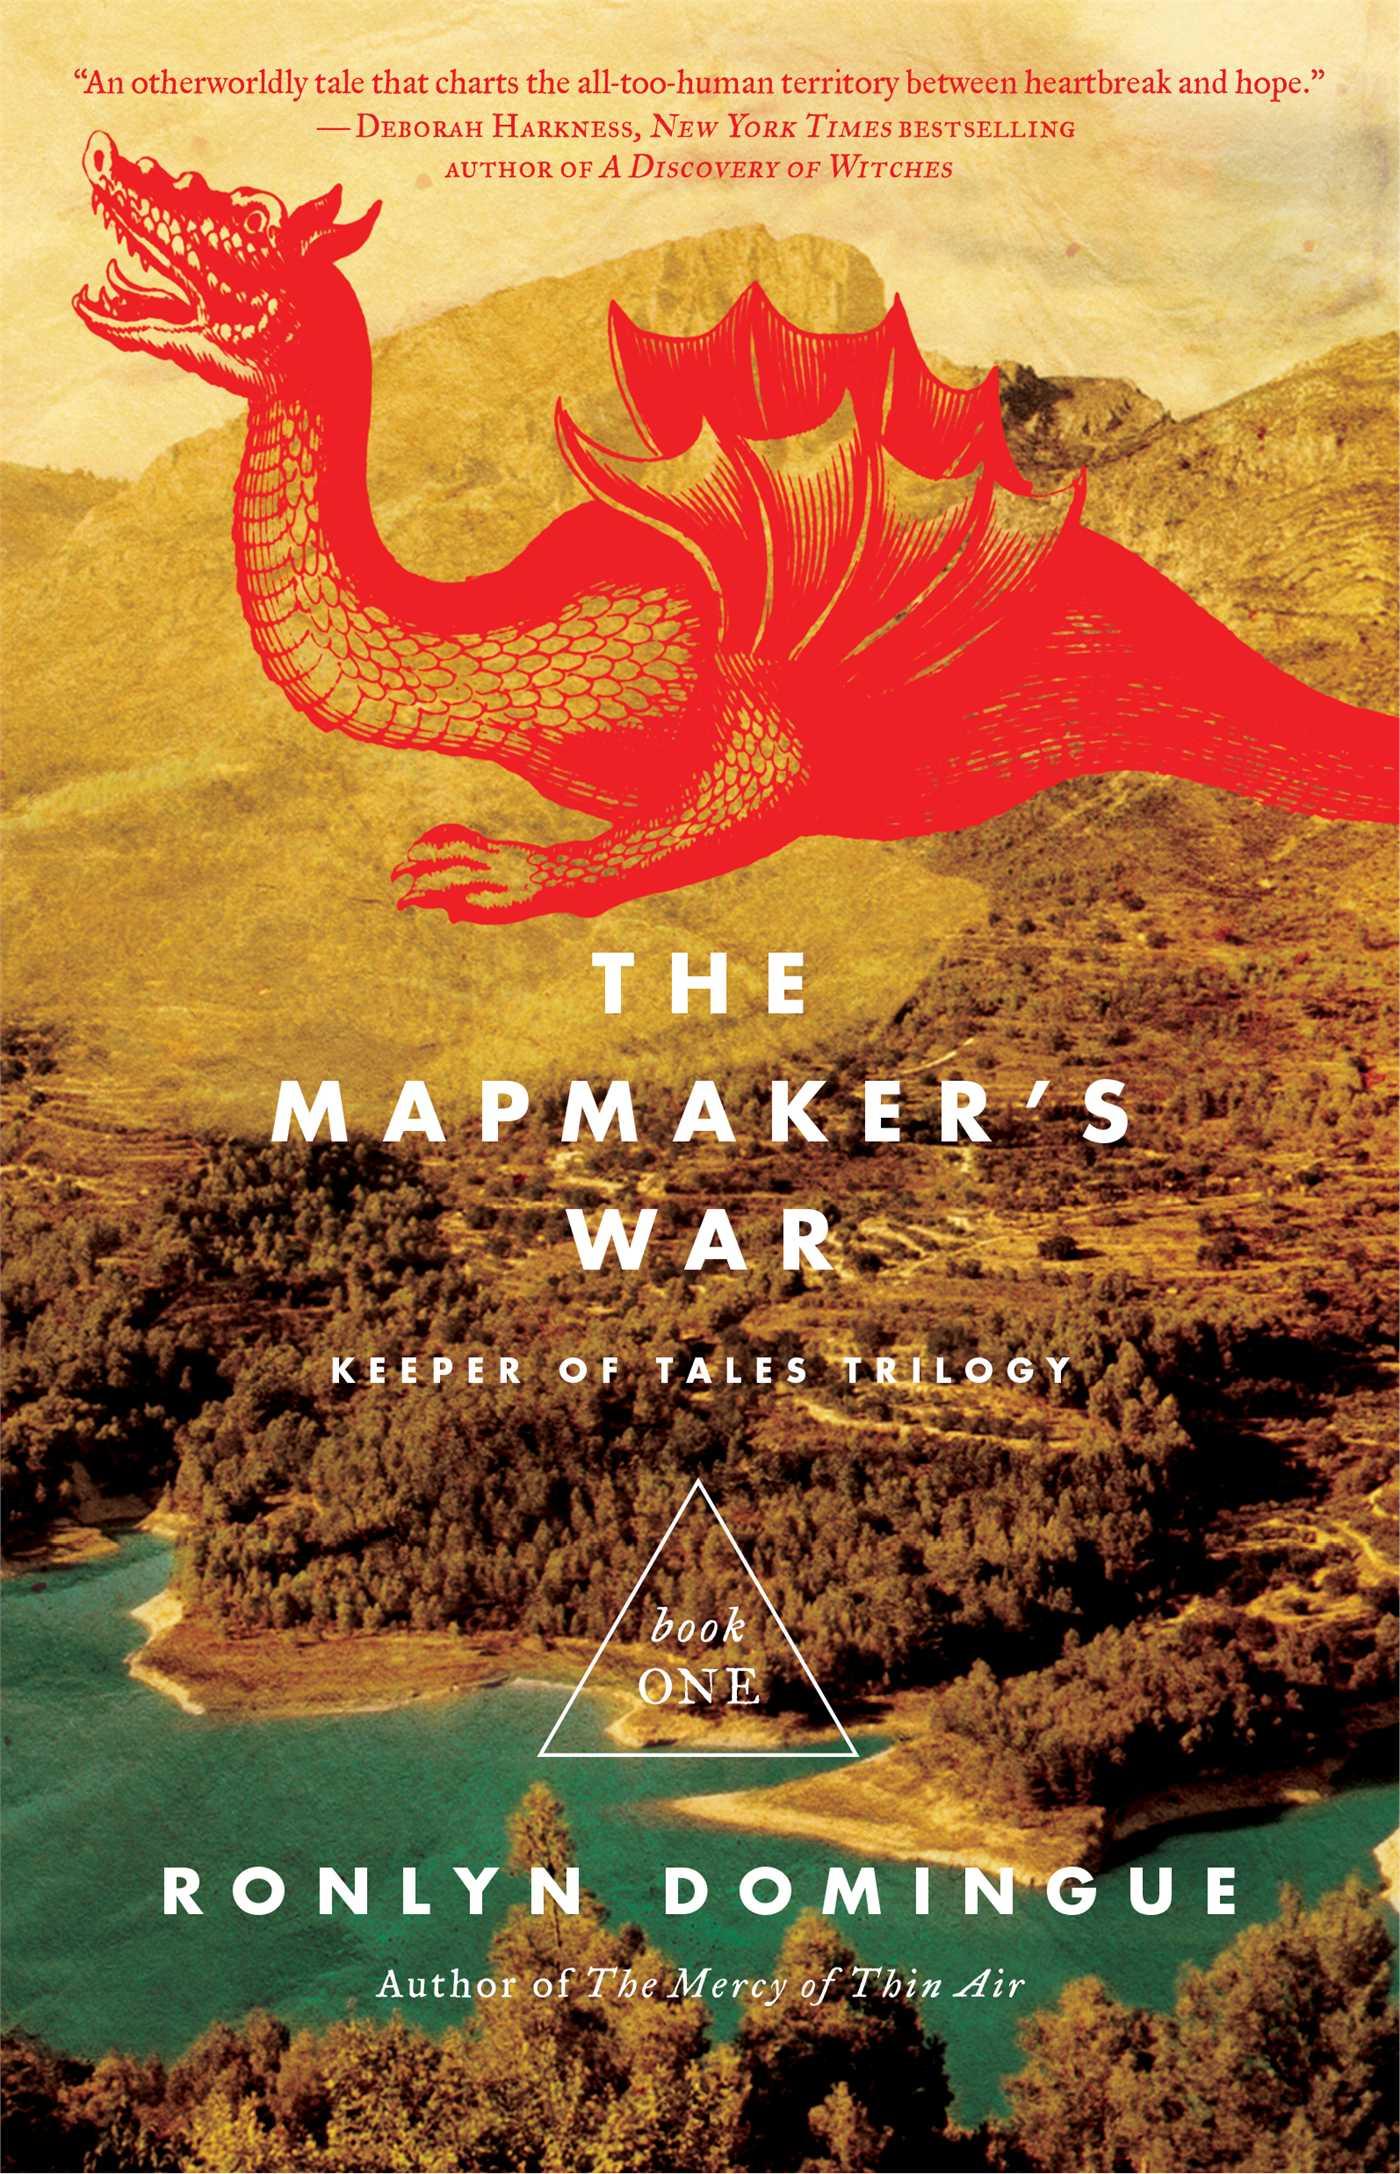 TheMapmakersWar